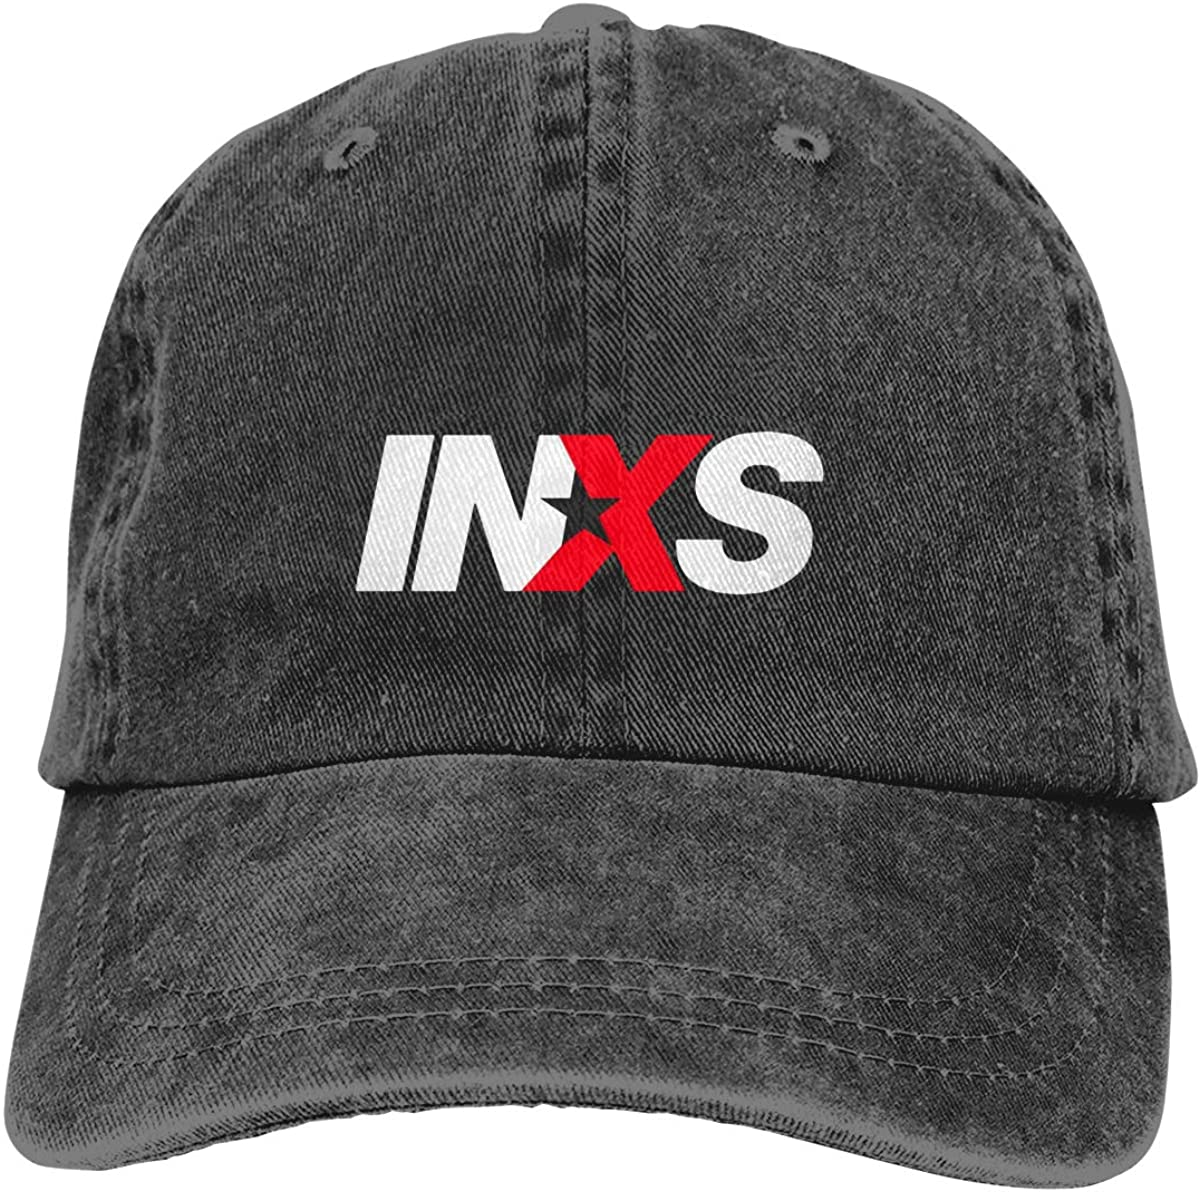 INXS Logo Unisex Baseball Caps Vintage Adjustable Denim Dad Hat Casquette